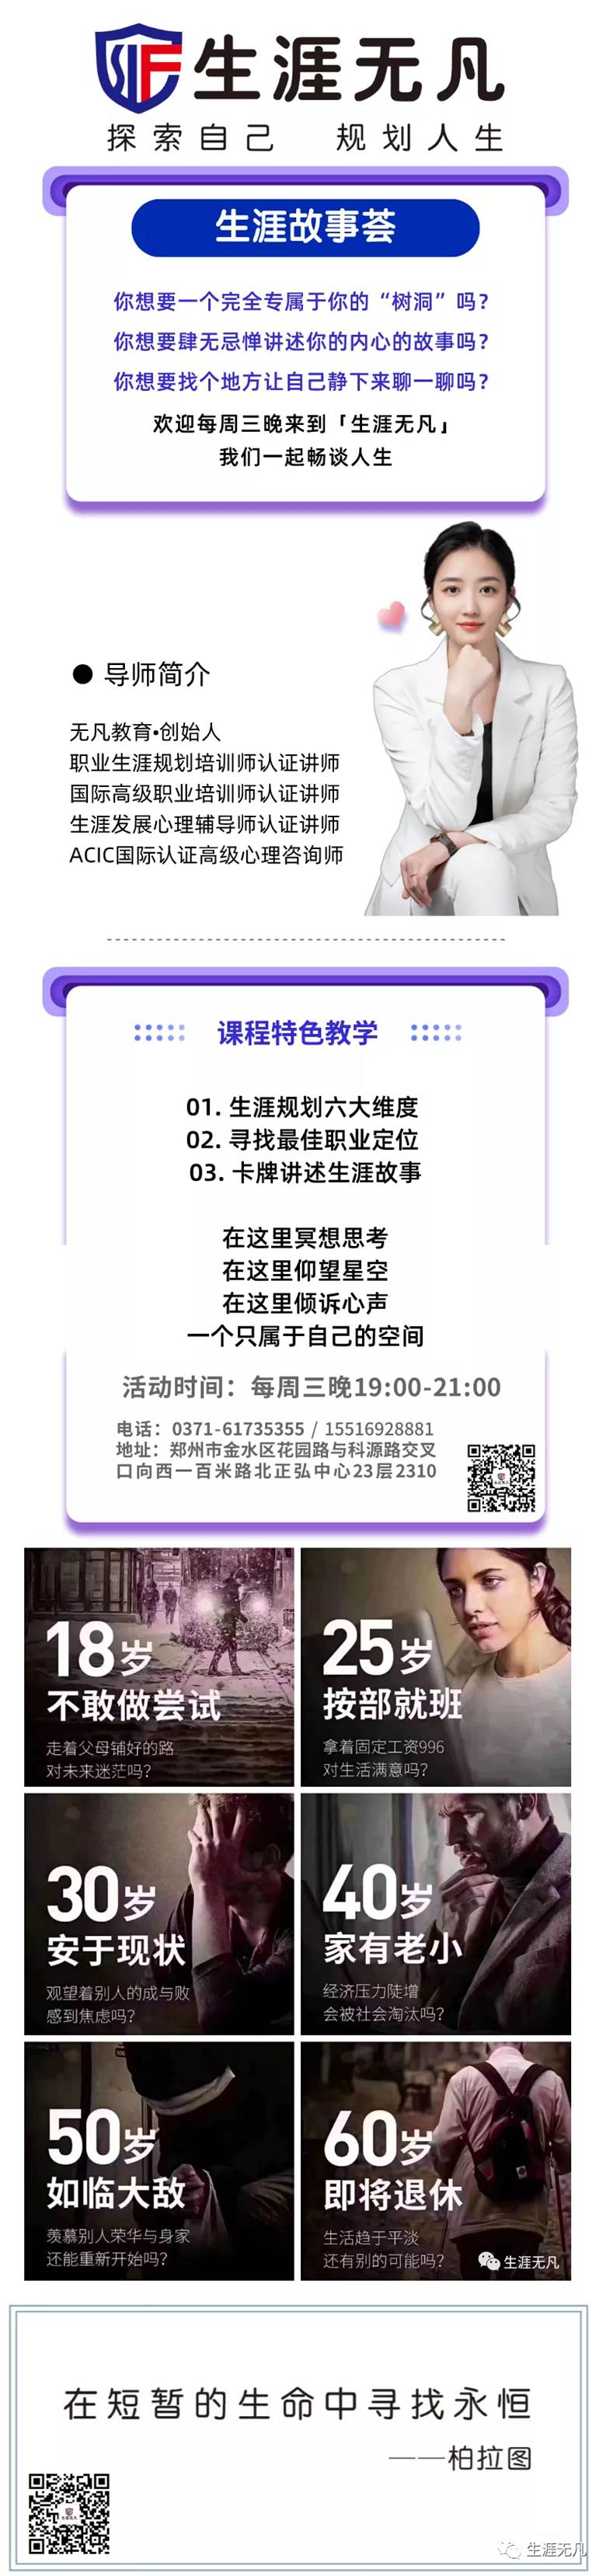 http://www.huodongxing.com/file/20201109/1733965473126/143983750618982.jpg